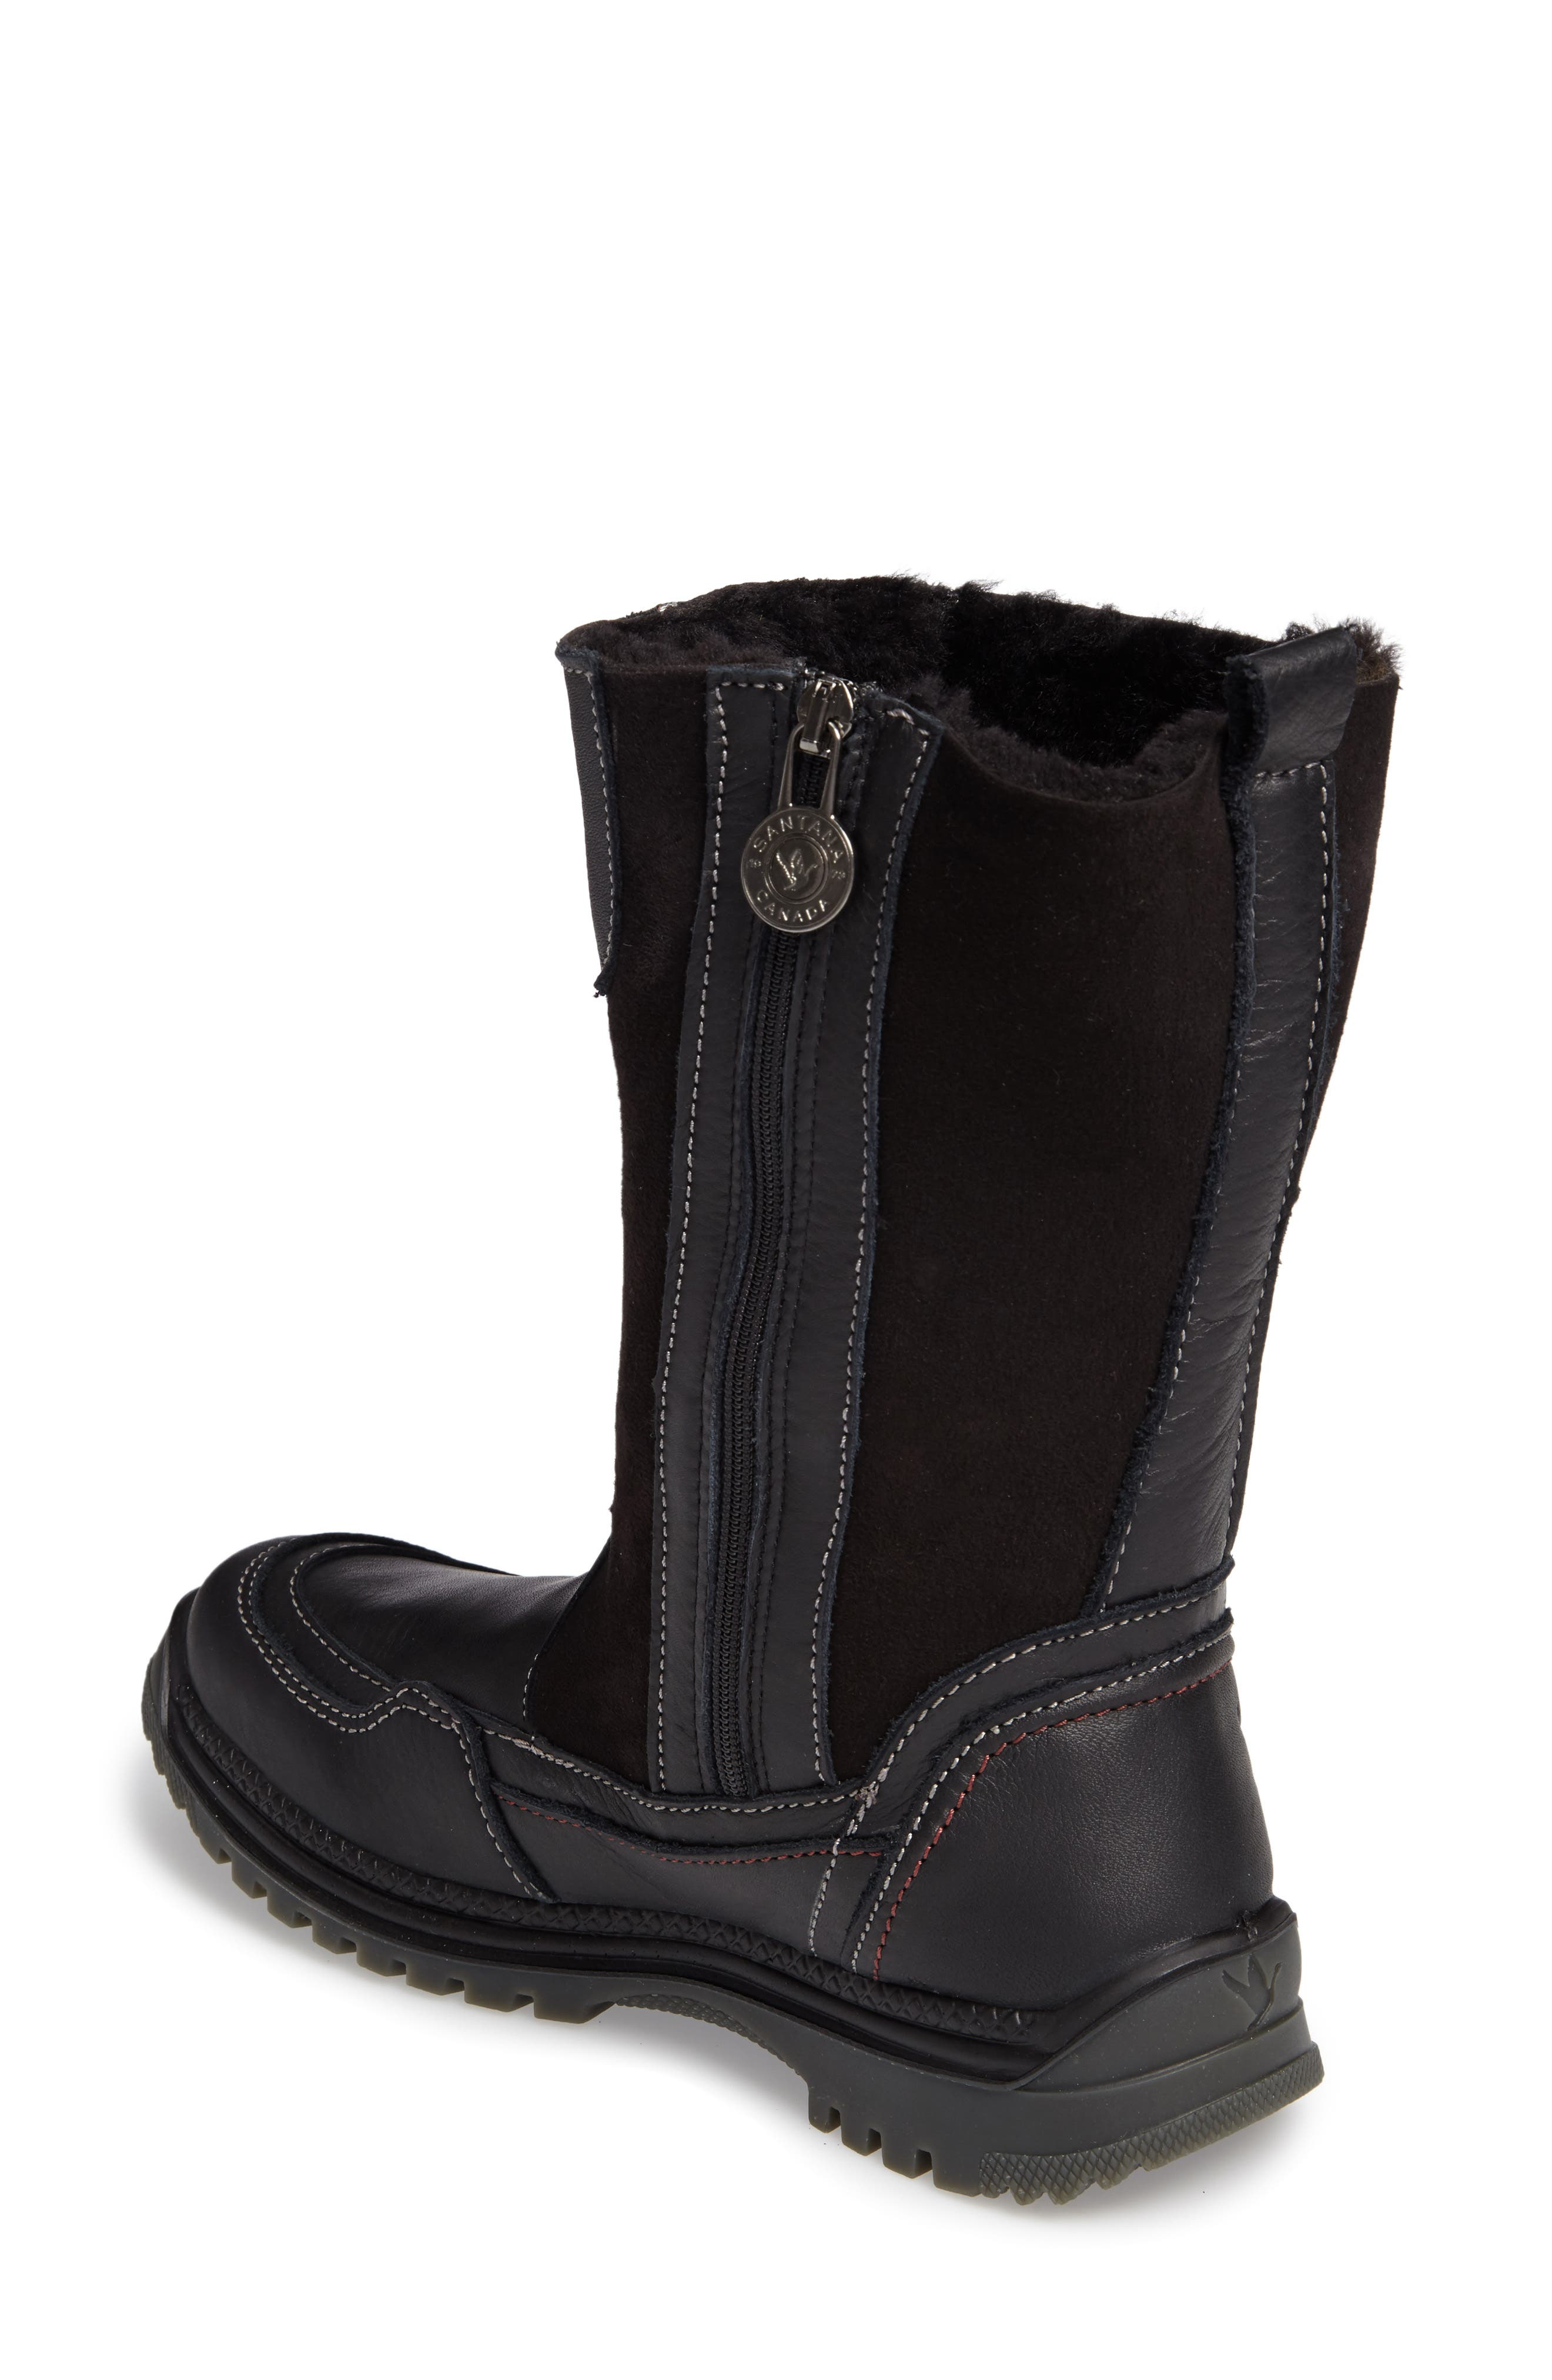 Seraphine Genuine Shearling Waterproof Winter Boot,                             Alternate thumbnail 3, color,                             001